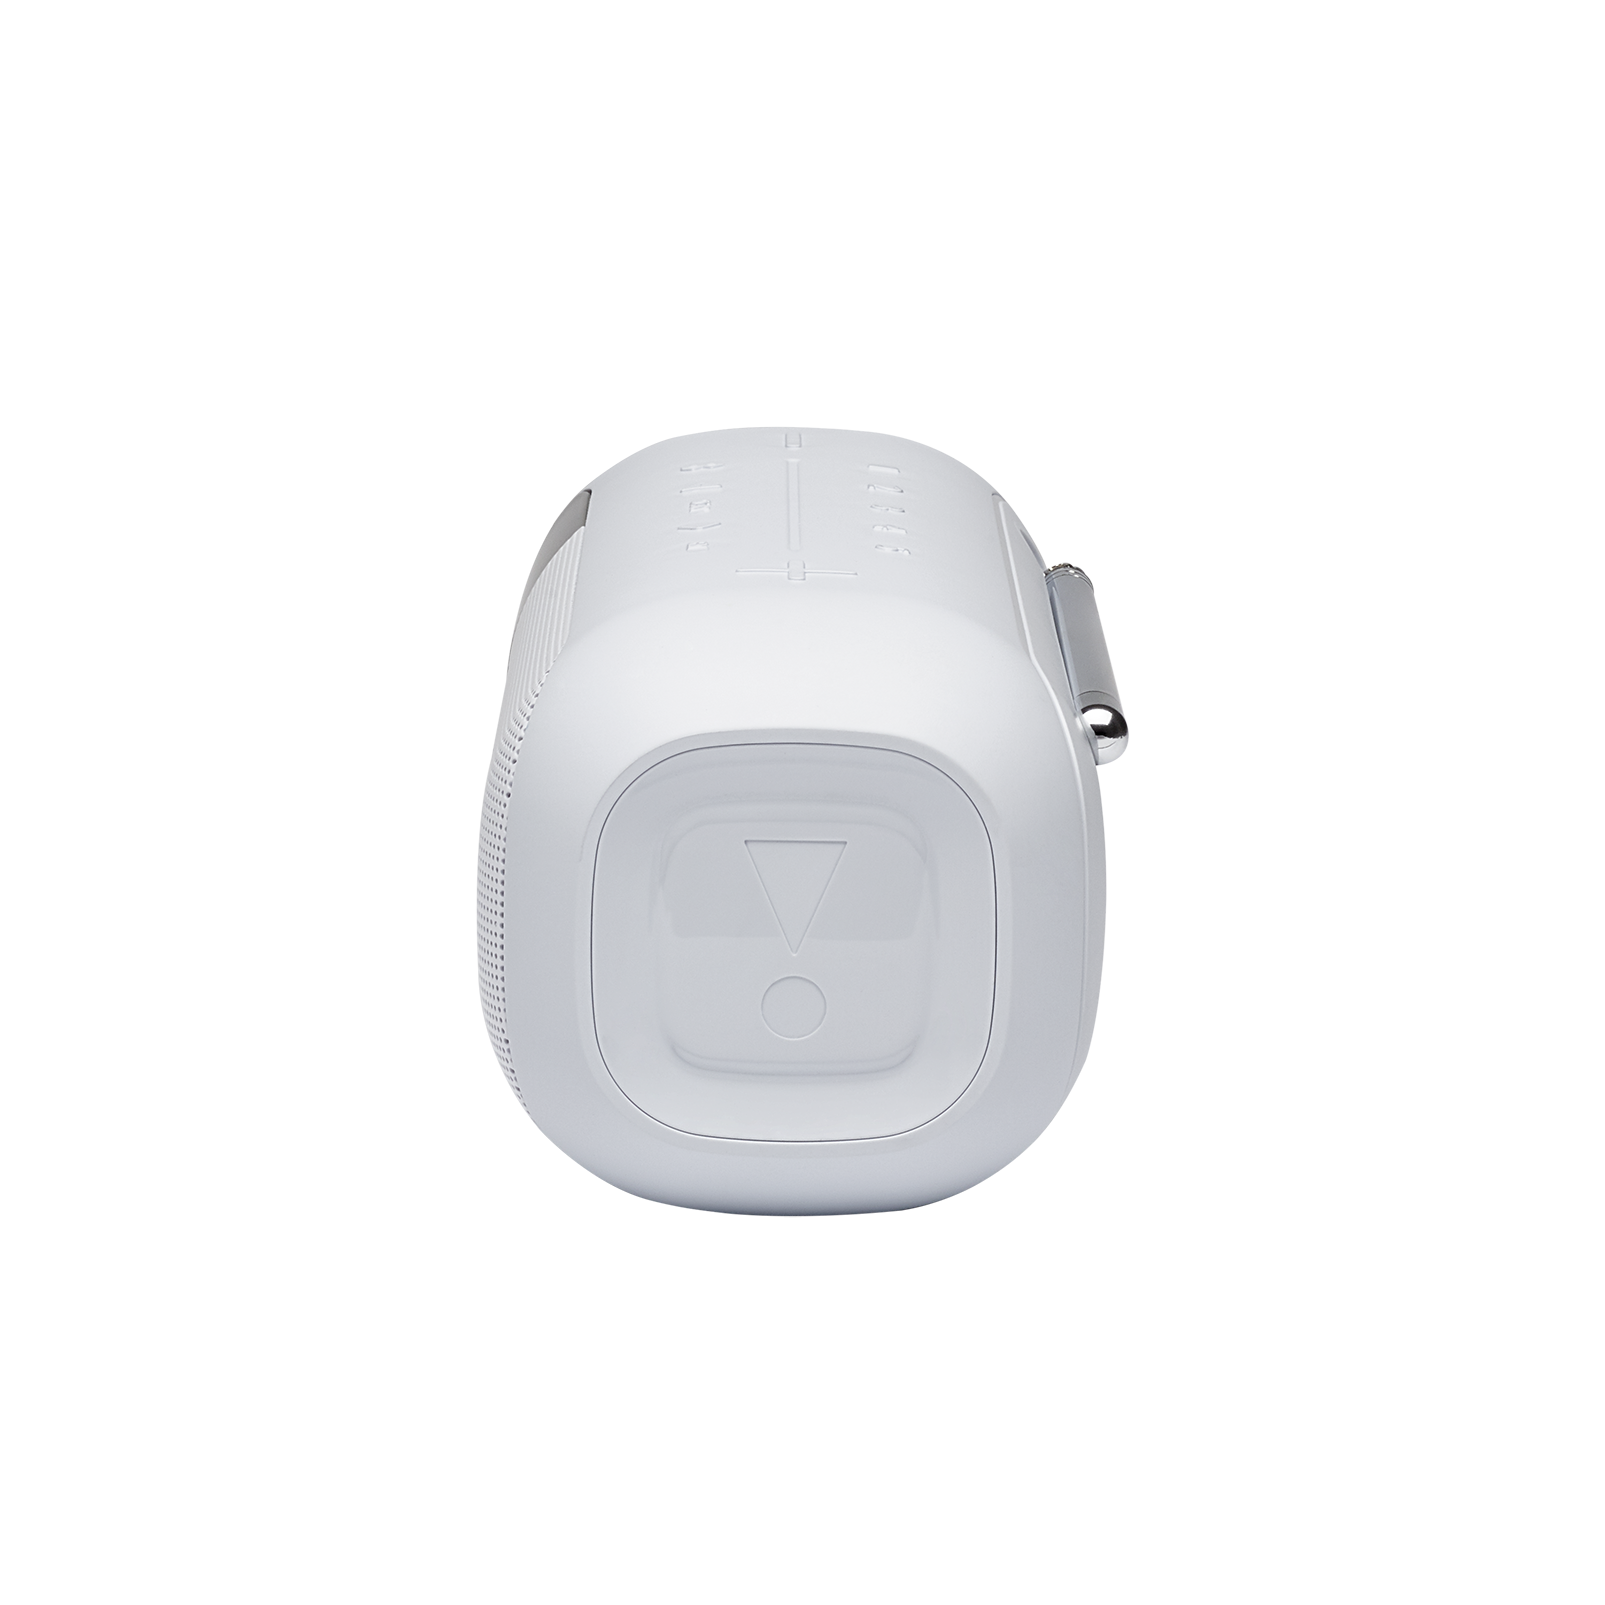 JBL Tuner 2 FM - White - Portable FM radio with Bluetooth - Left